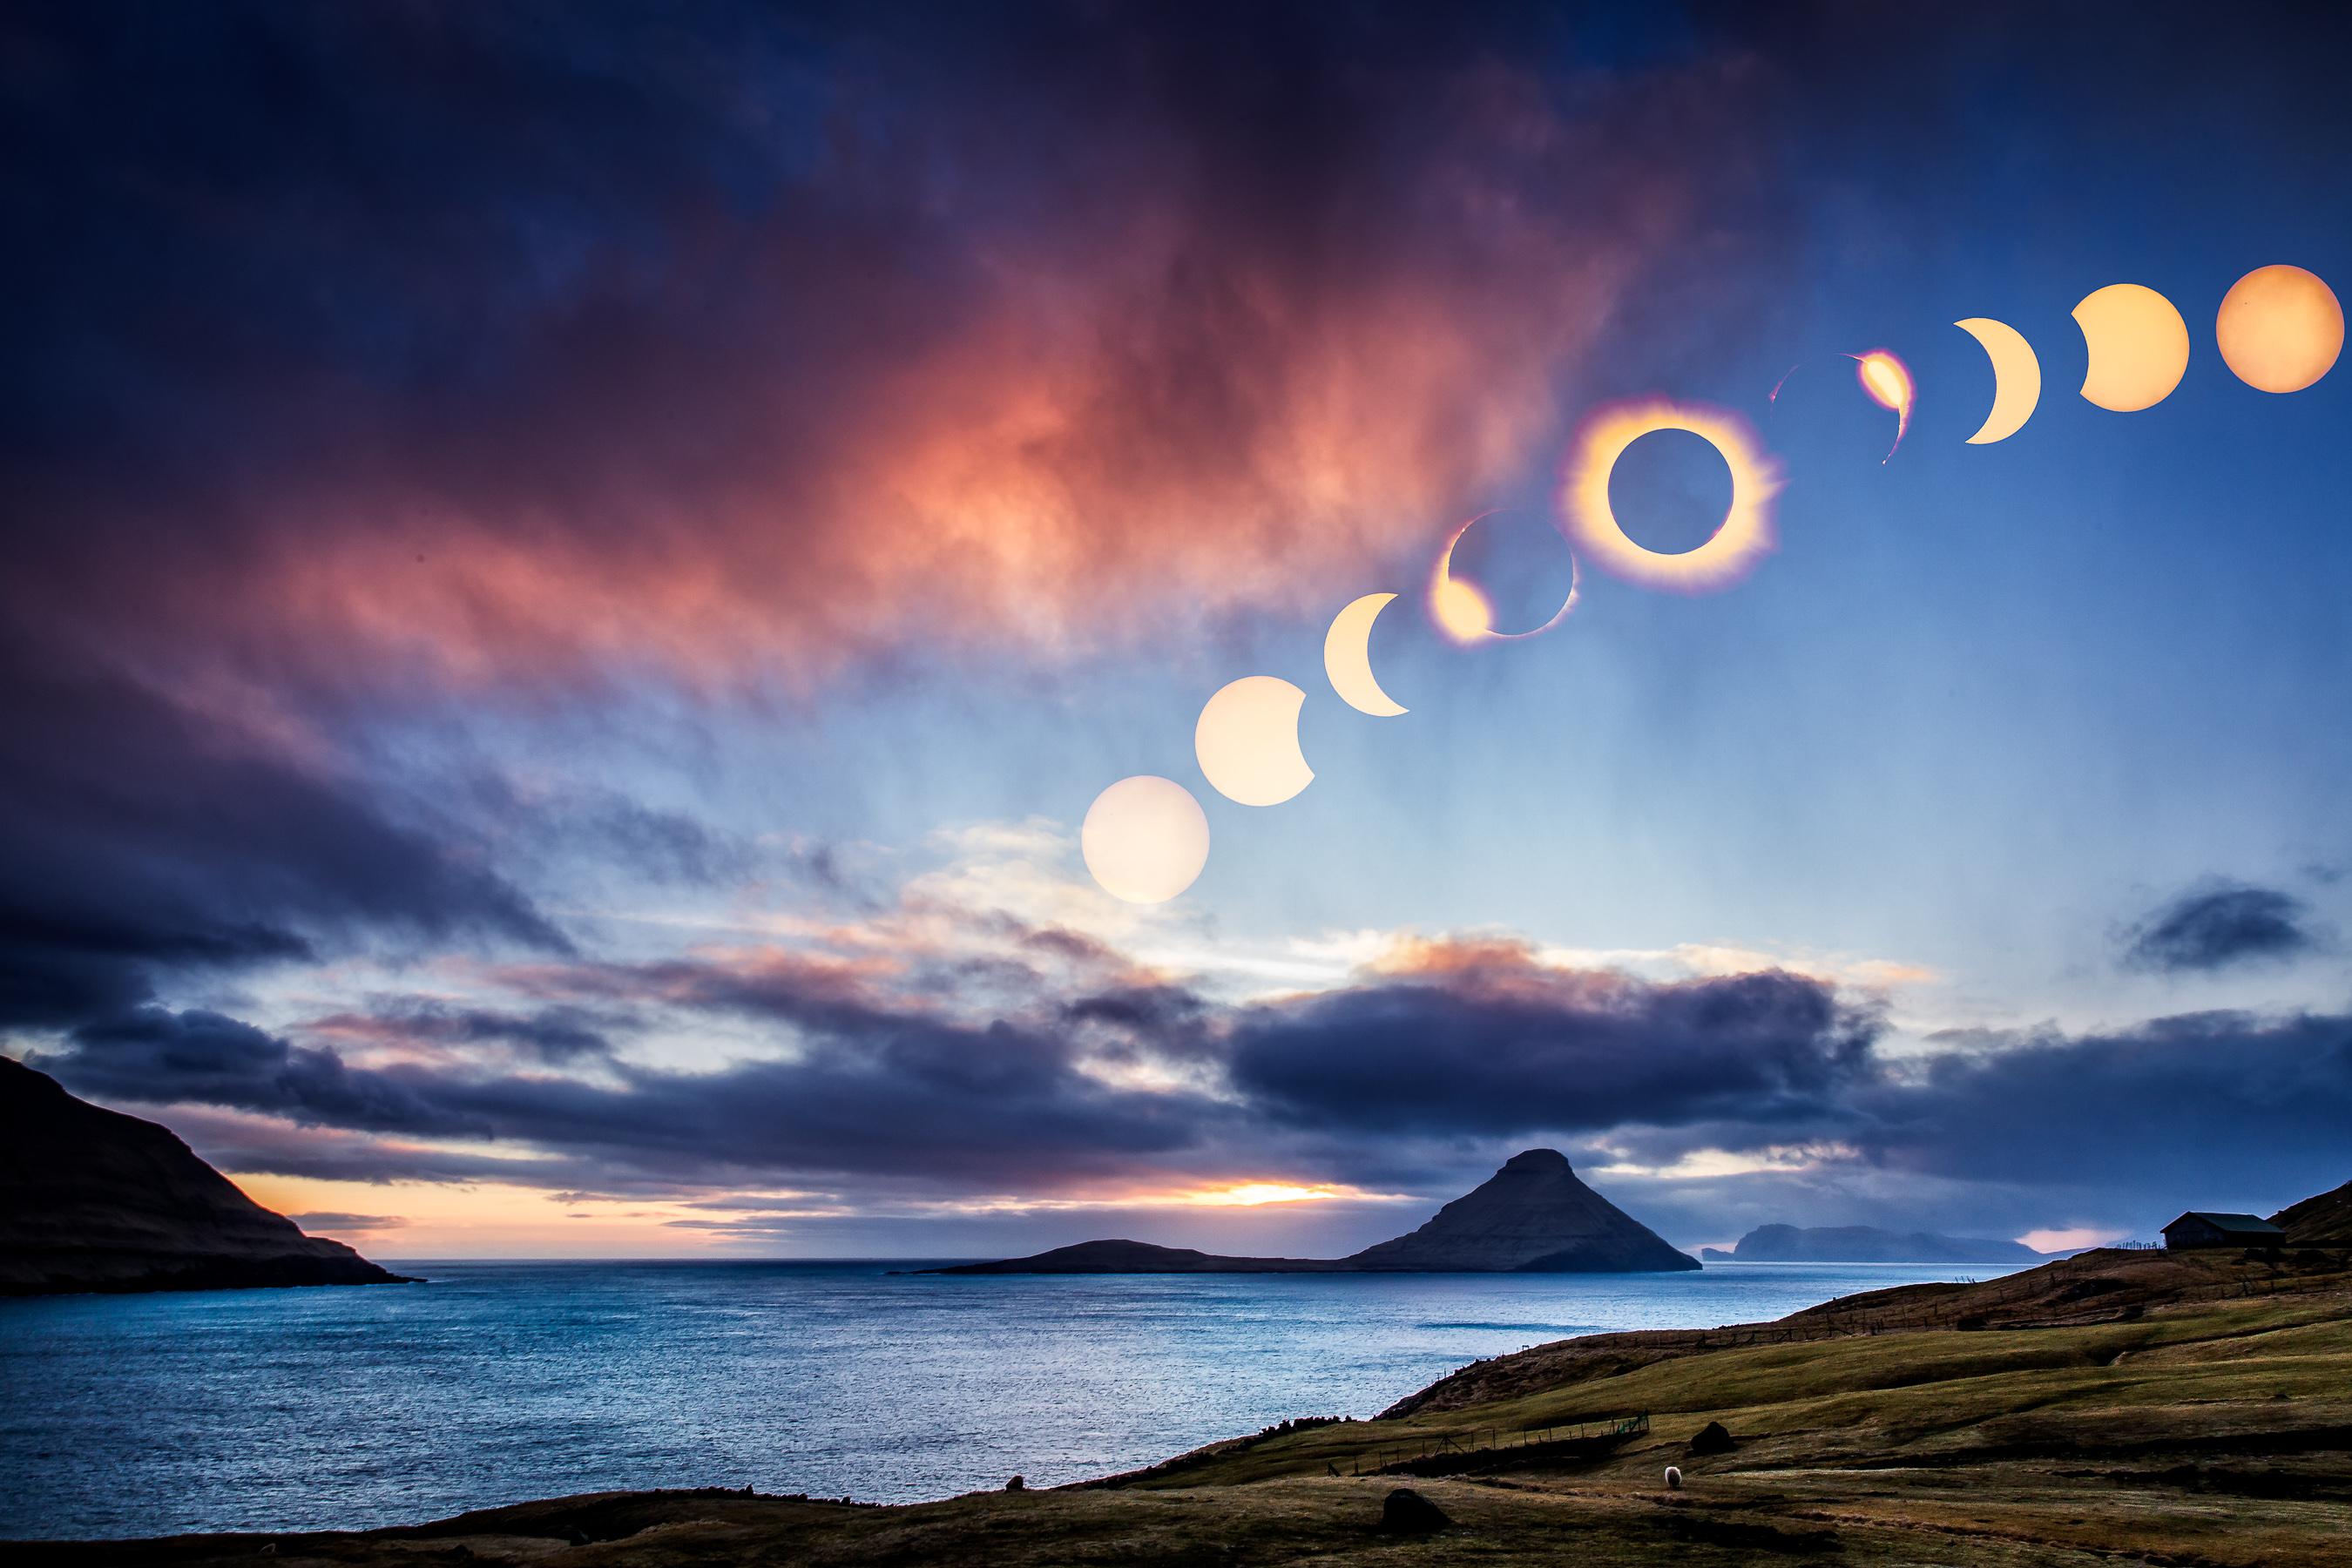 Total Solar Eclipse 20 March 2015 Faroe Islands